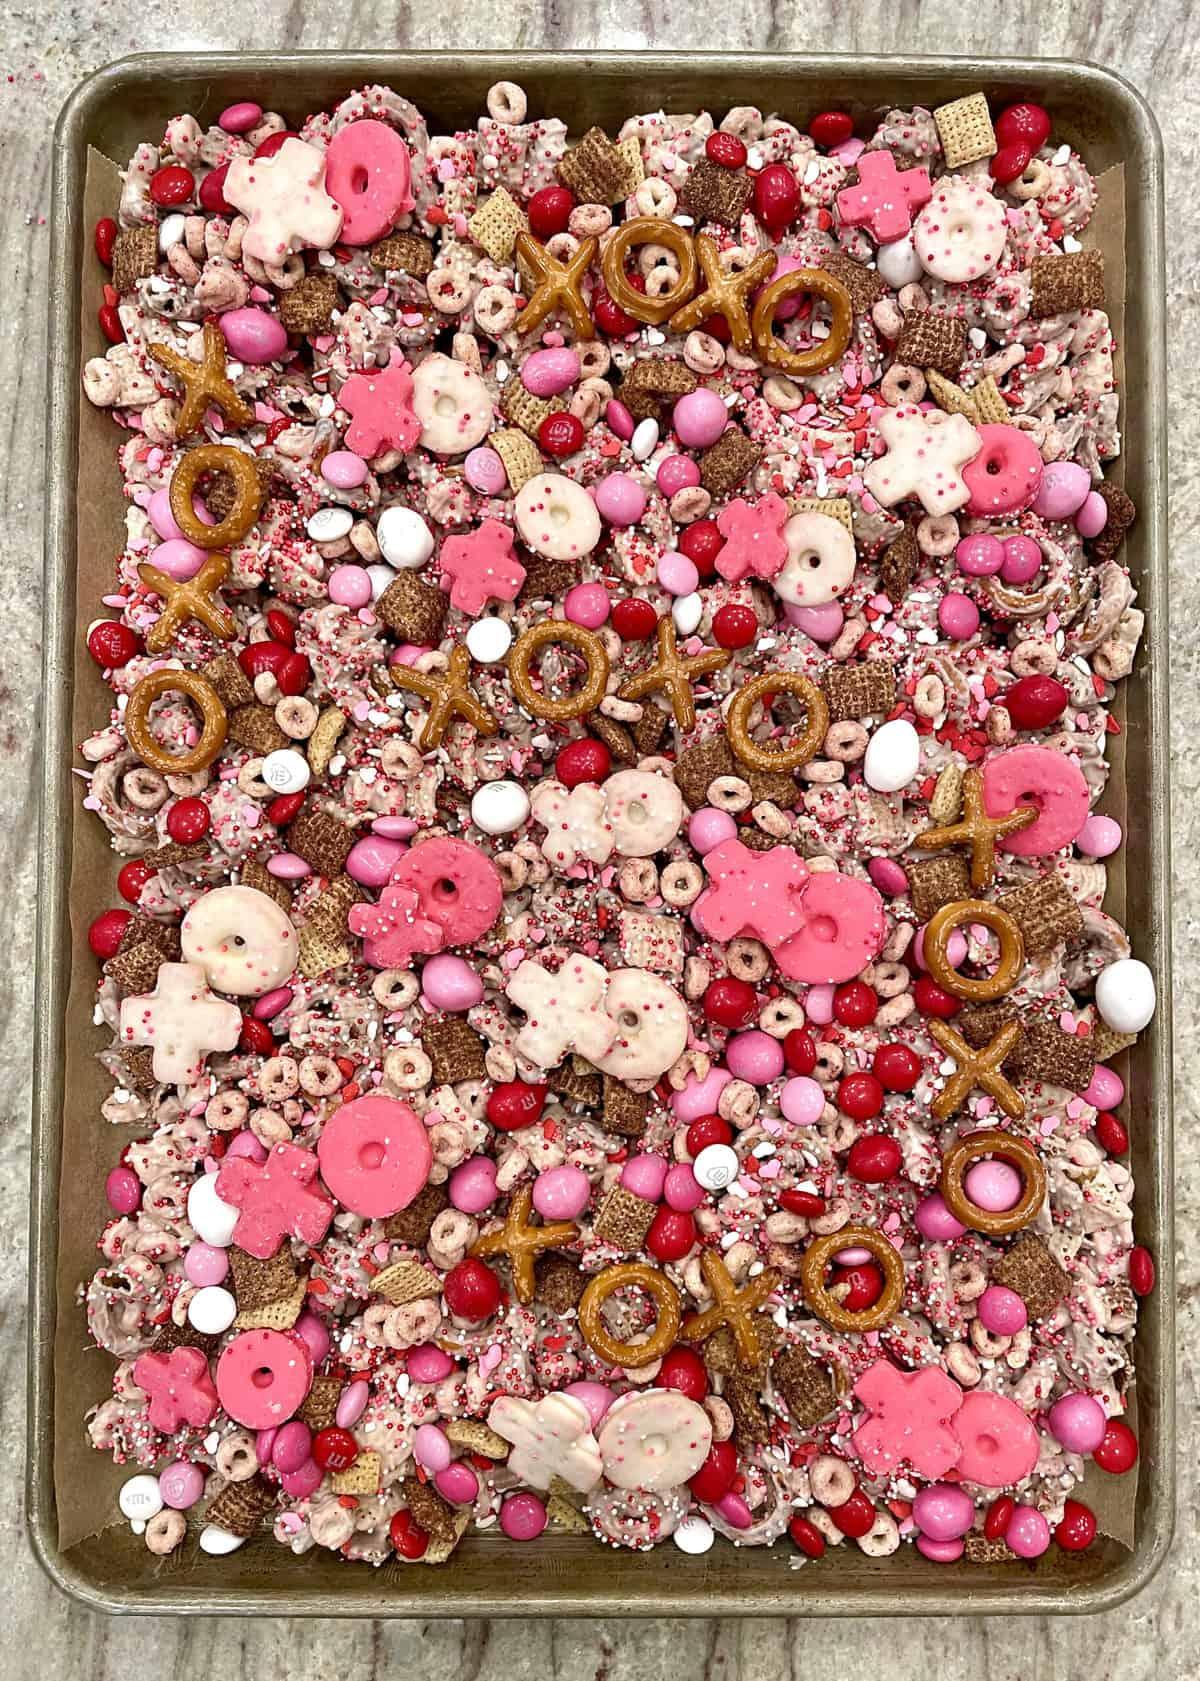 Finished XOXO Valentine's Day Snack Mix on a Baking Sheet